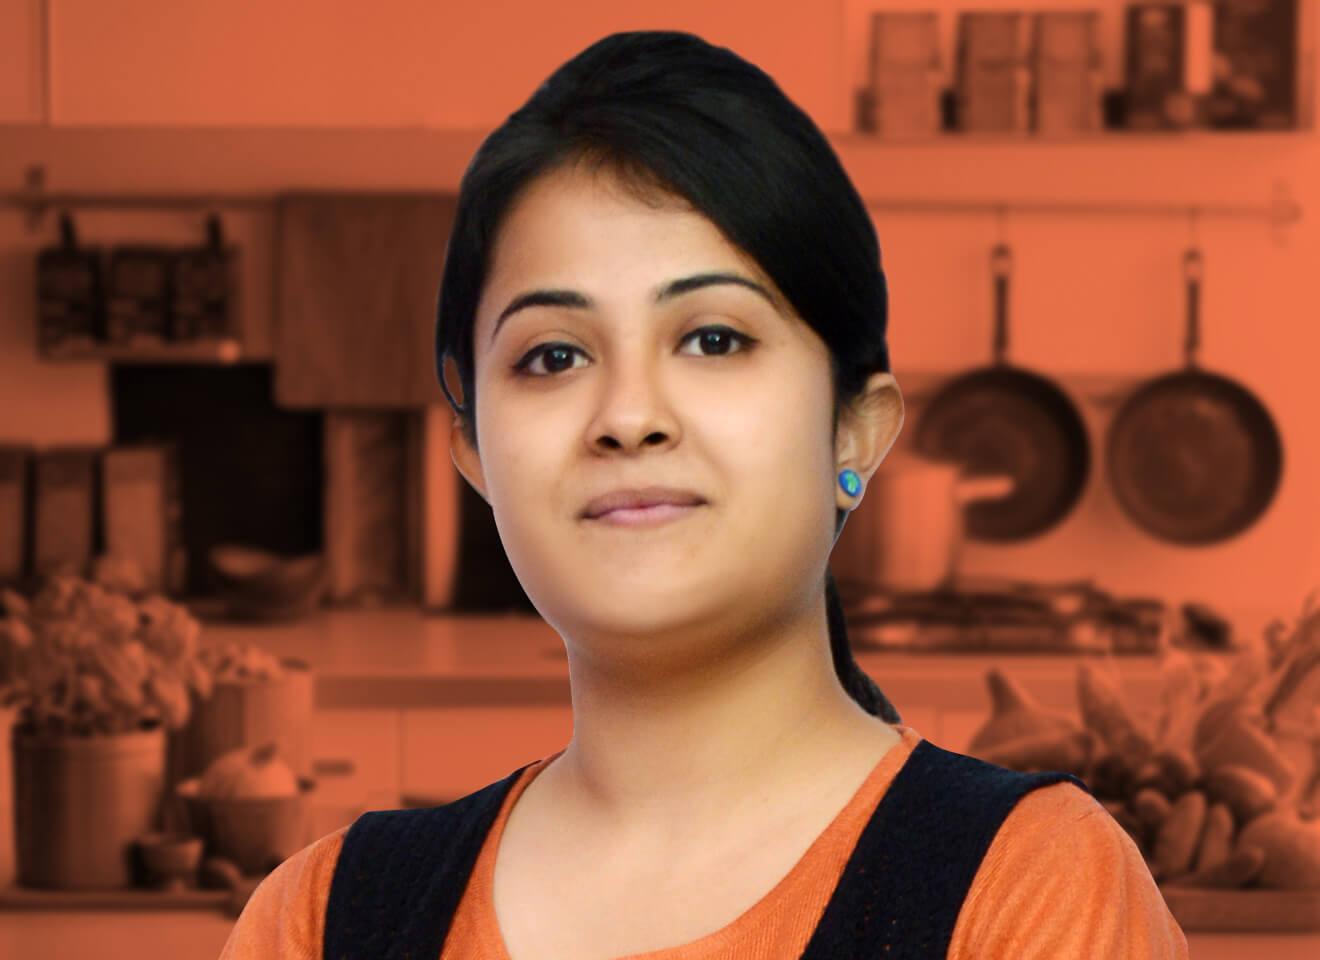 Shahida Choudhury